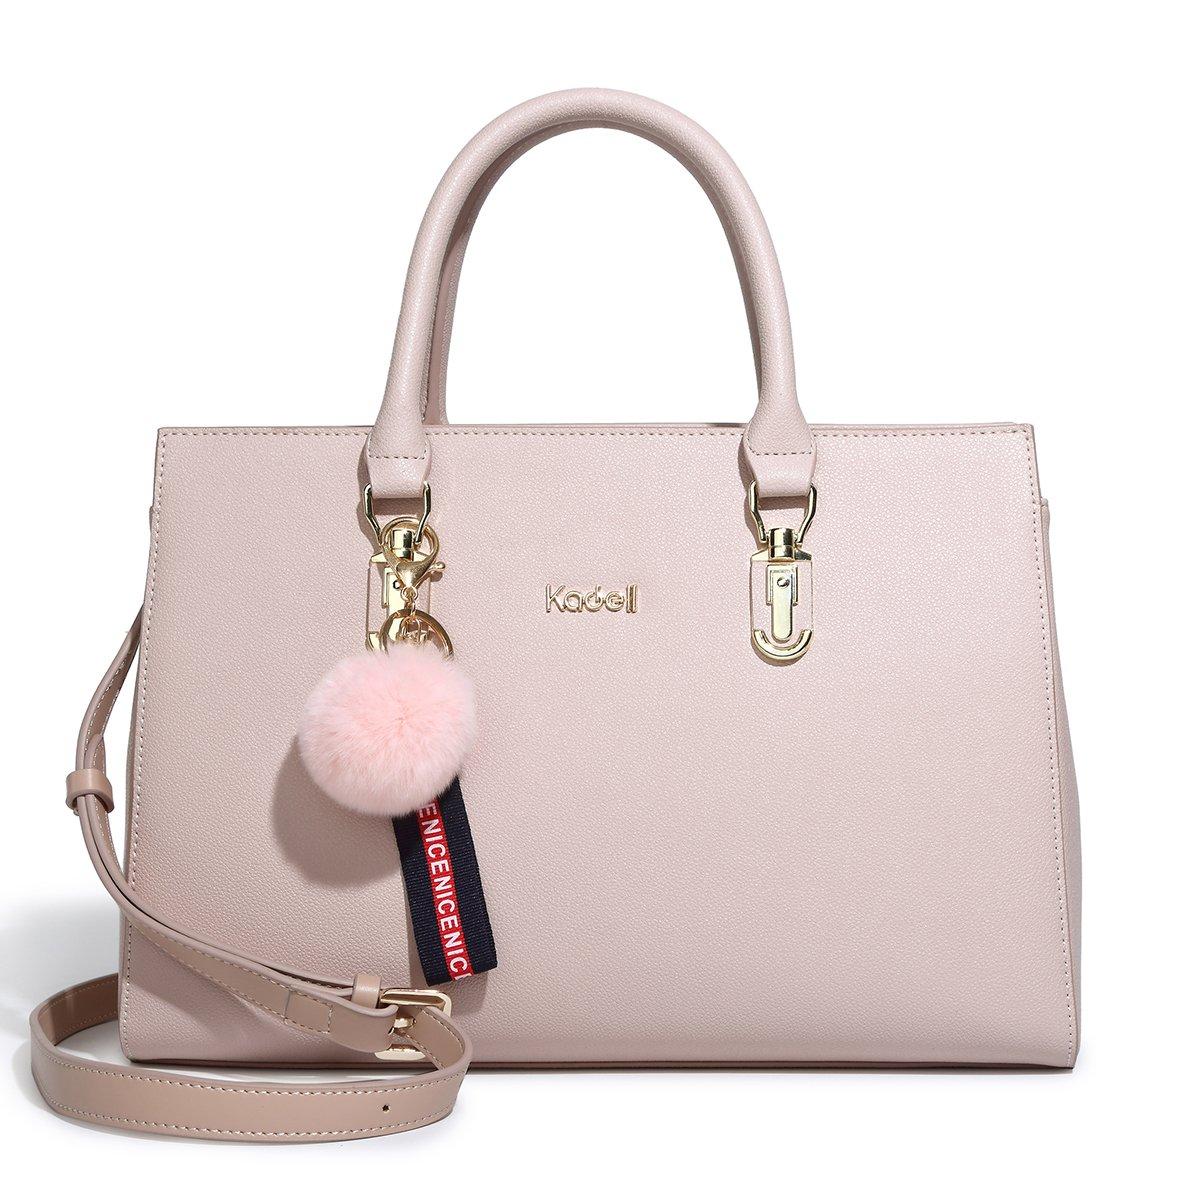 Kadell New Shoulder Handbags for Women PU Leather Crossbody Tote Purses Luxury Designer Lady Bags Pink